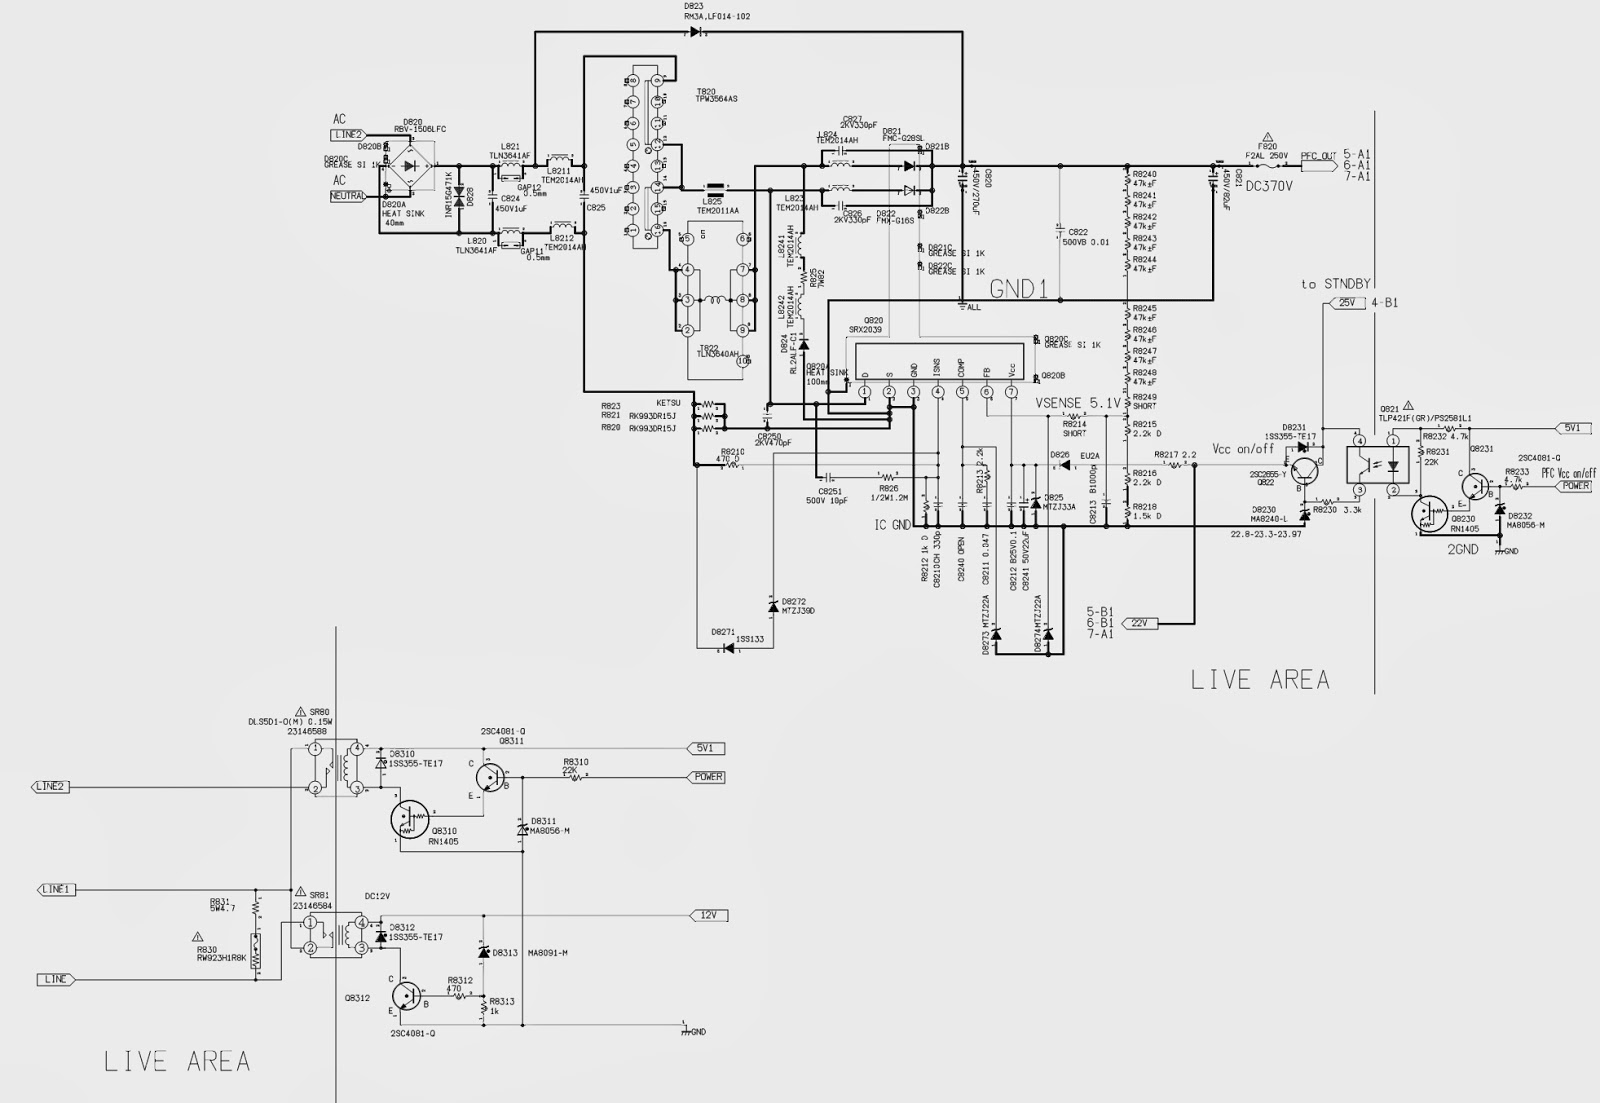 hight resolution of toshiba 32 37 42wl58 series lcd tvs power supply schematics lcd tvs power supply schematics circuit diagram str